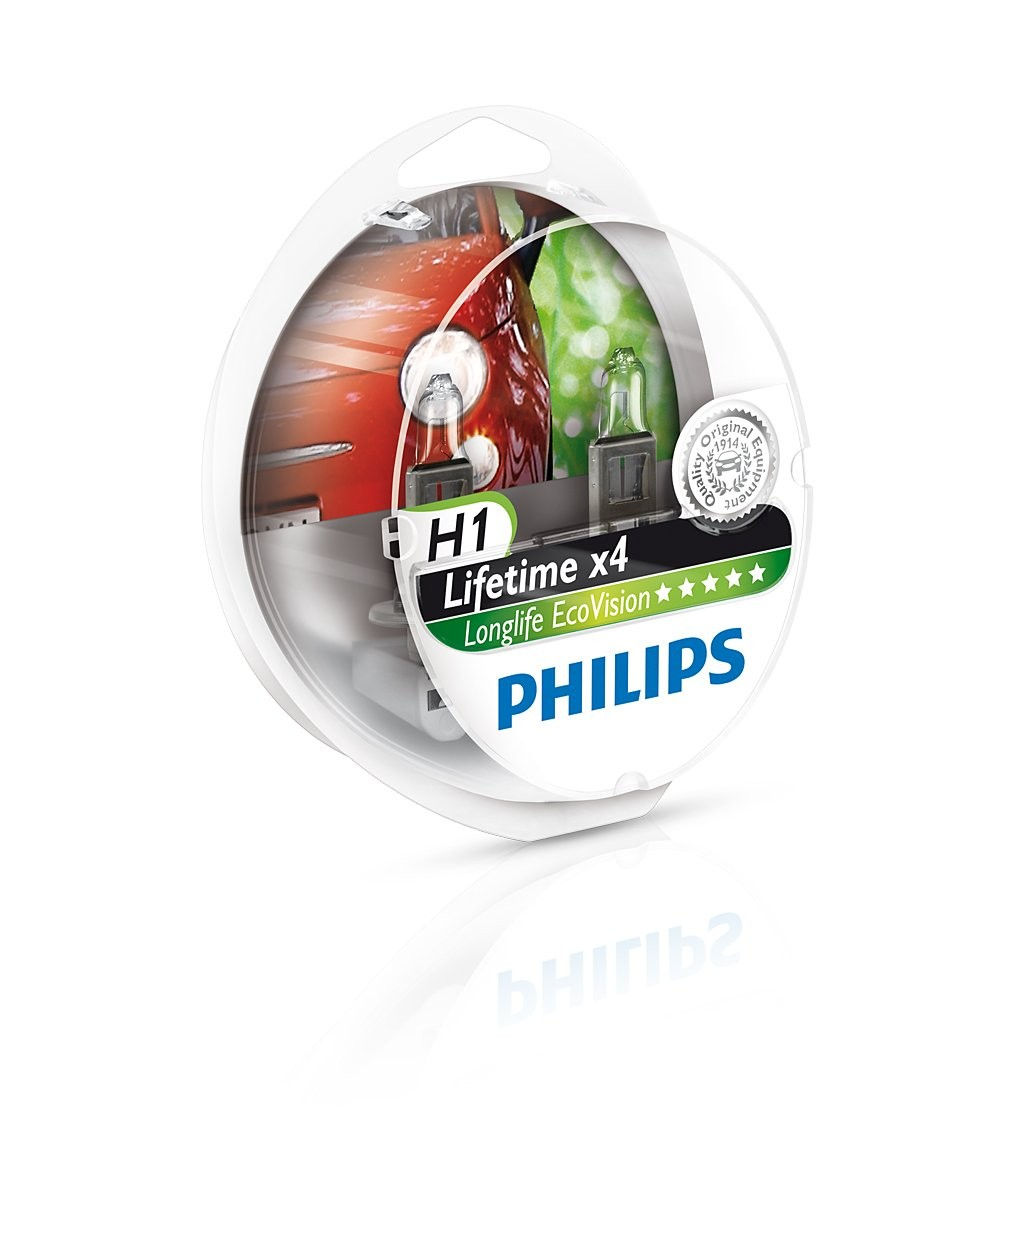 Philips lemputės Longlife Ecovision H1, H4, H7